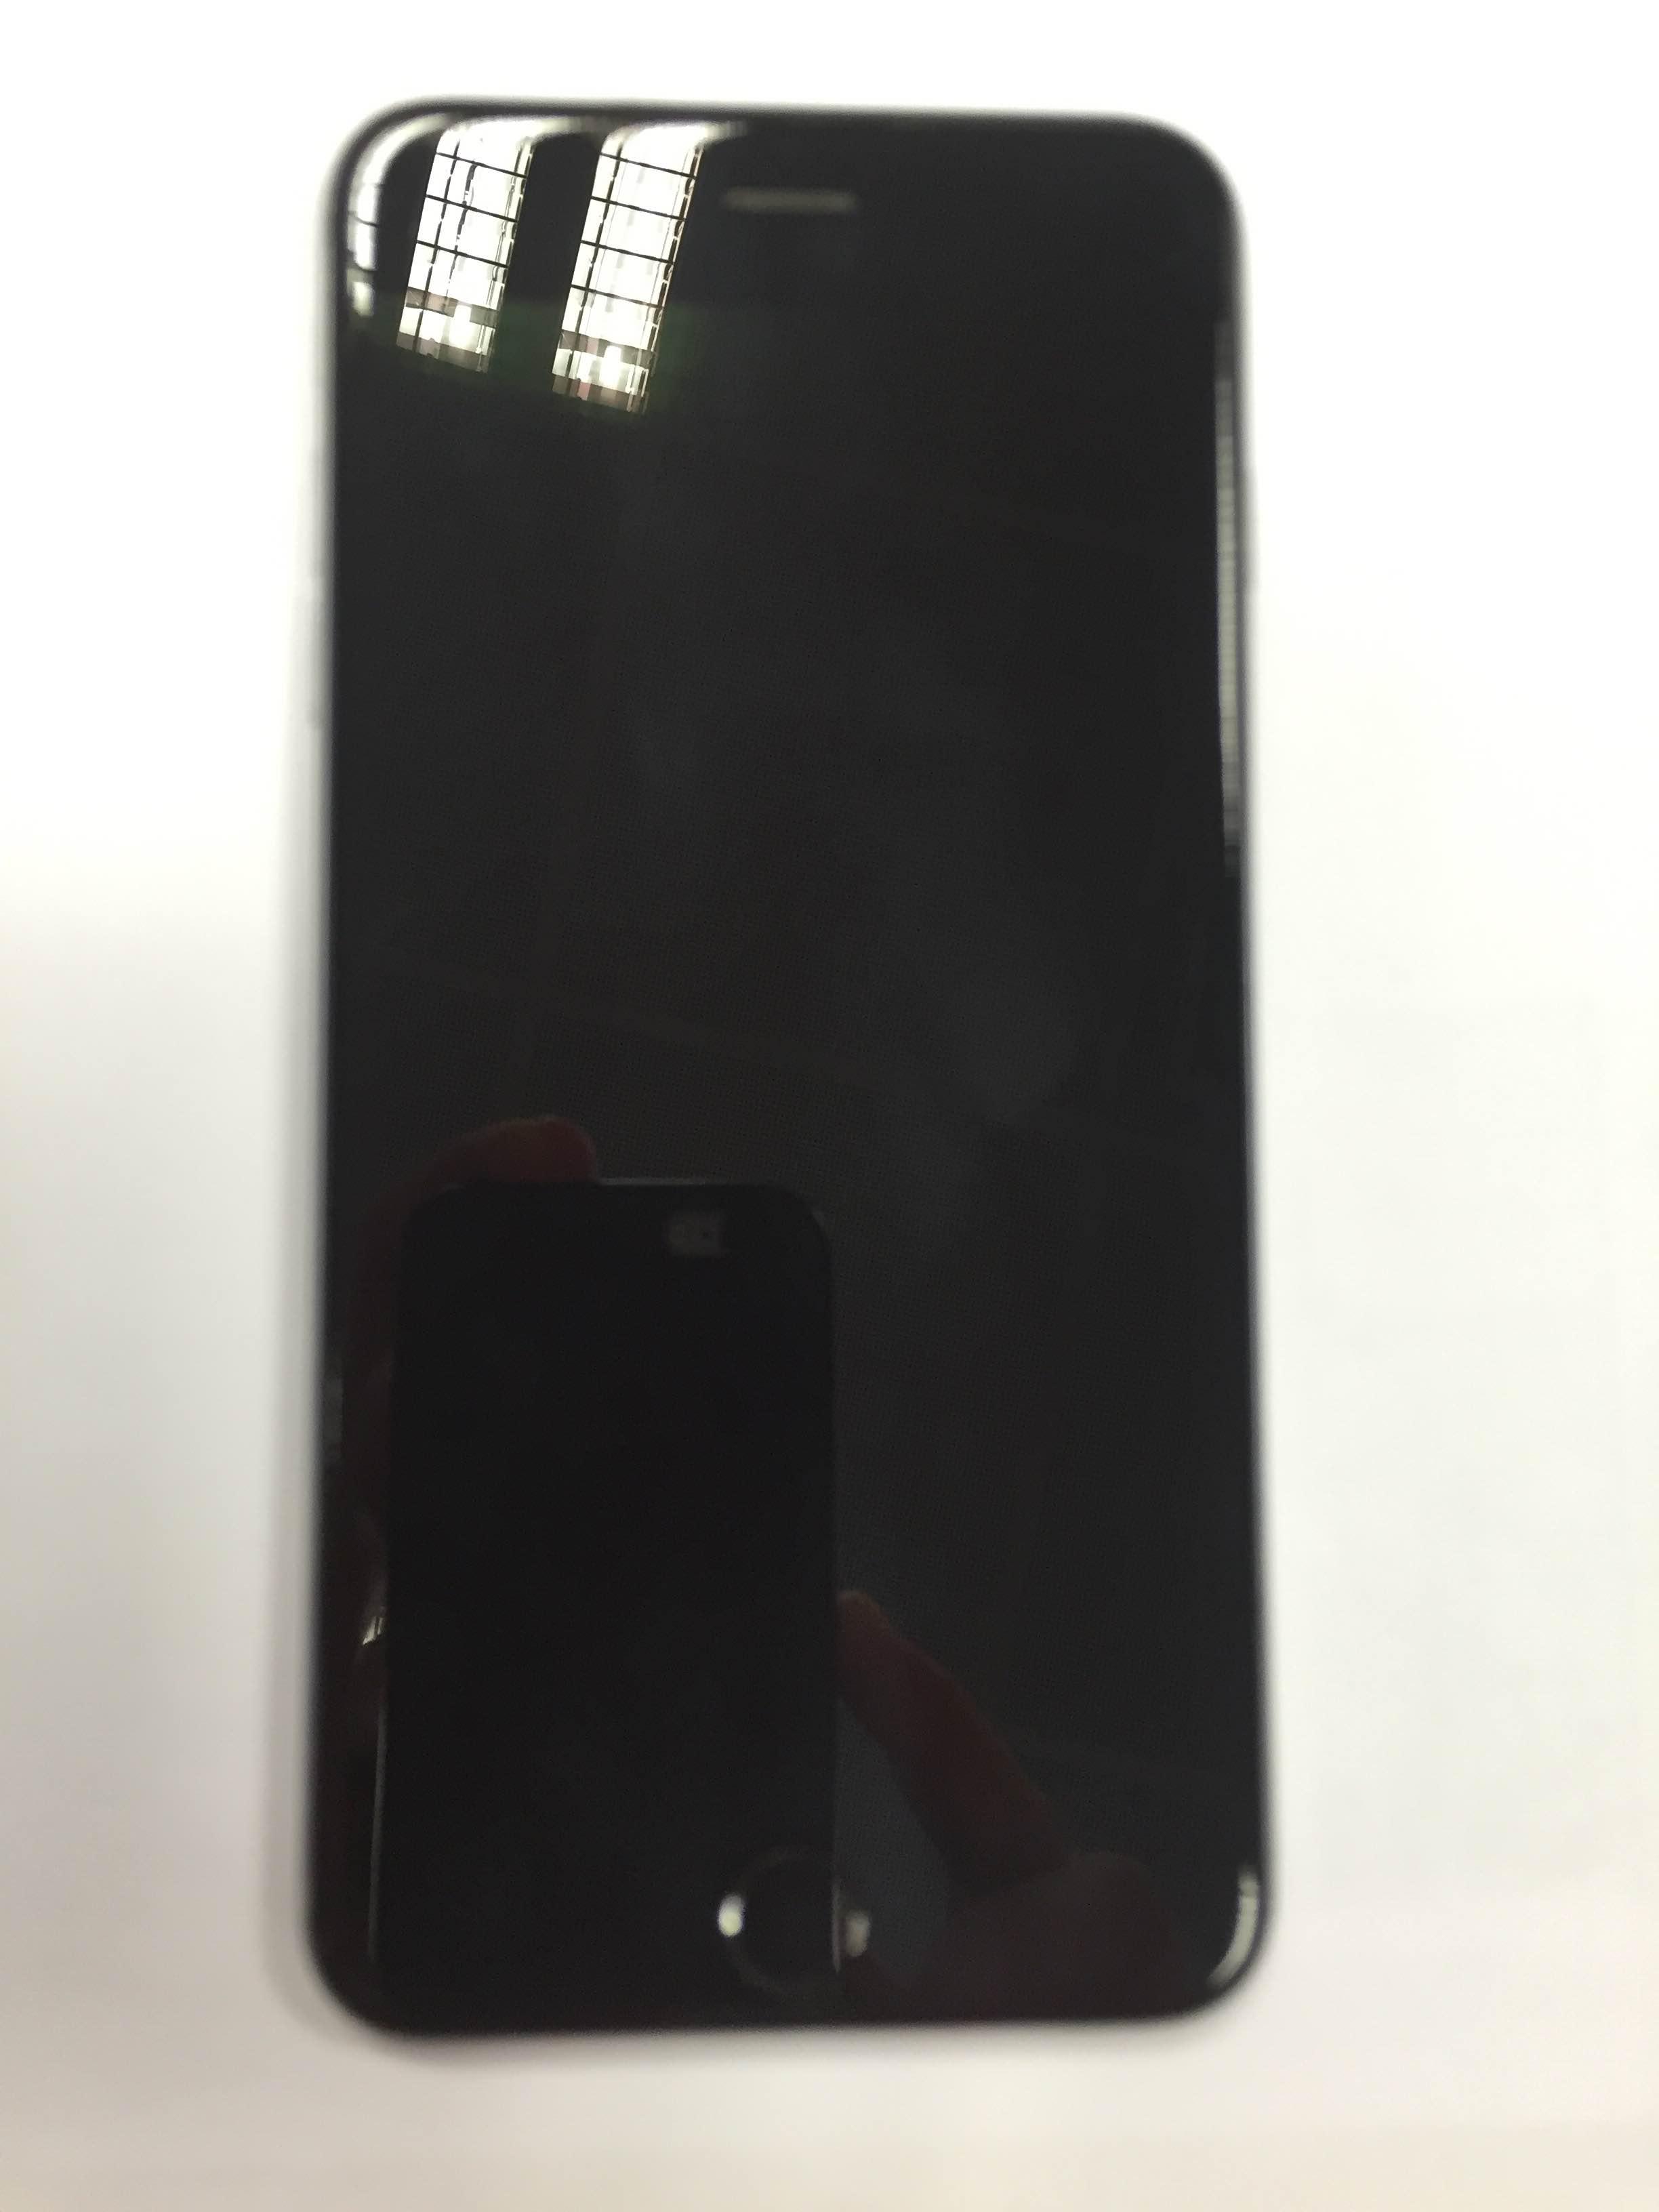 Iphone  Gris Espacial Gb